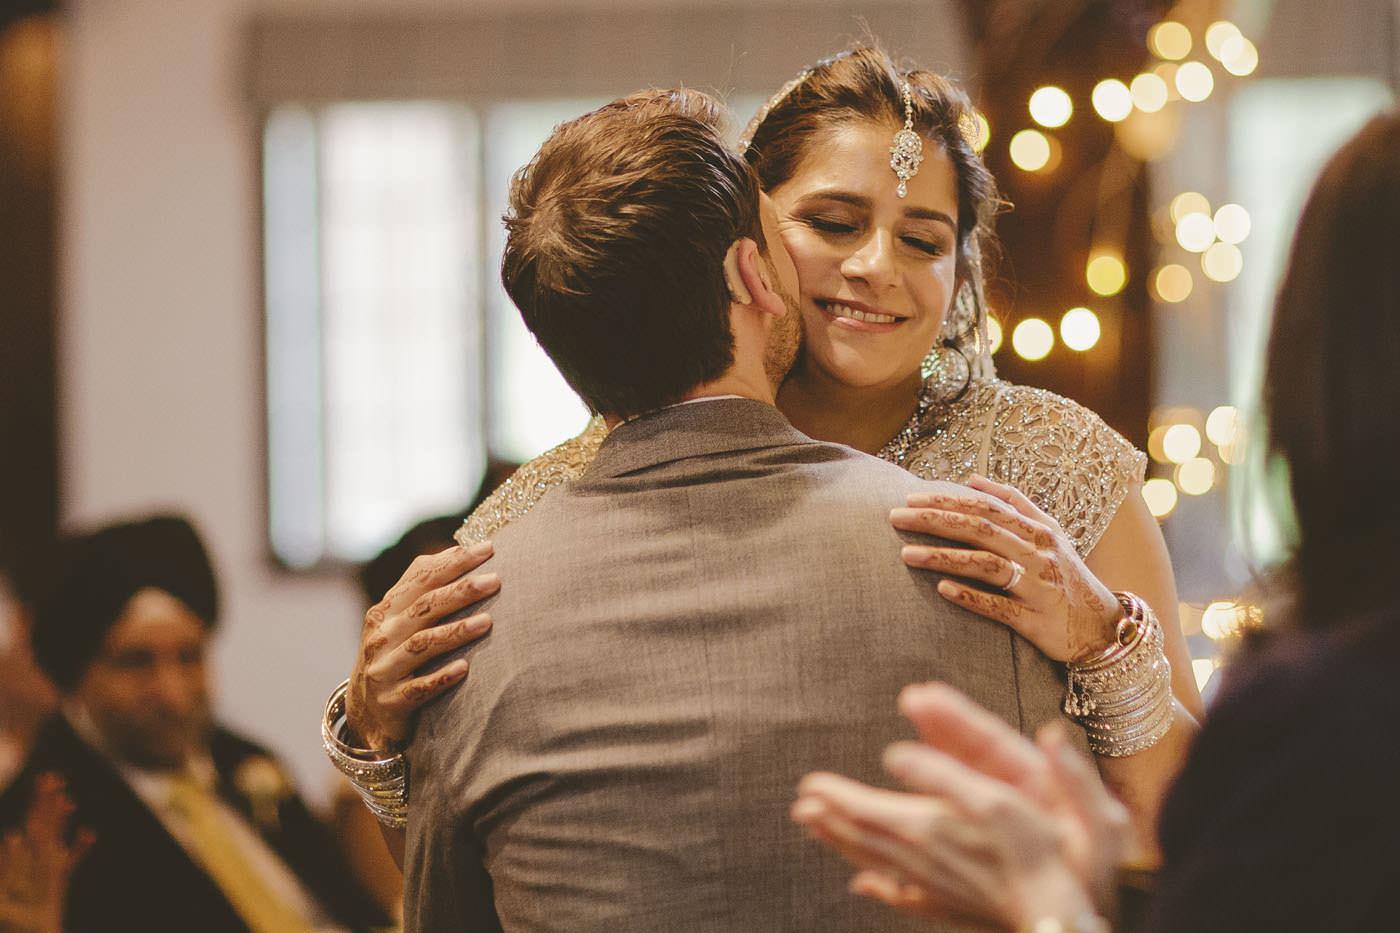 edmundjasveen burford bridge hotel wedding photographer 0045